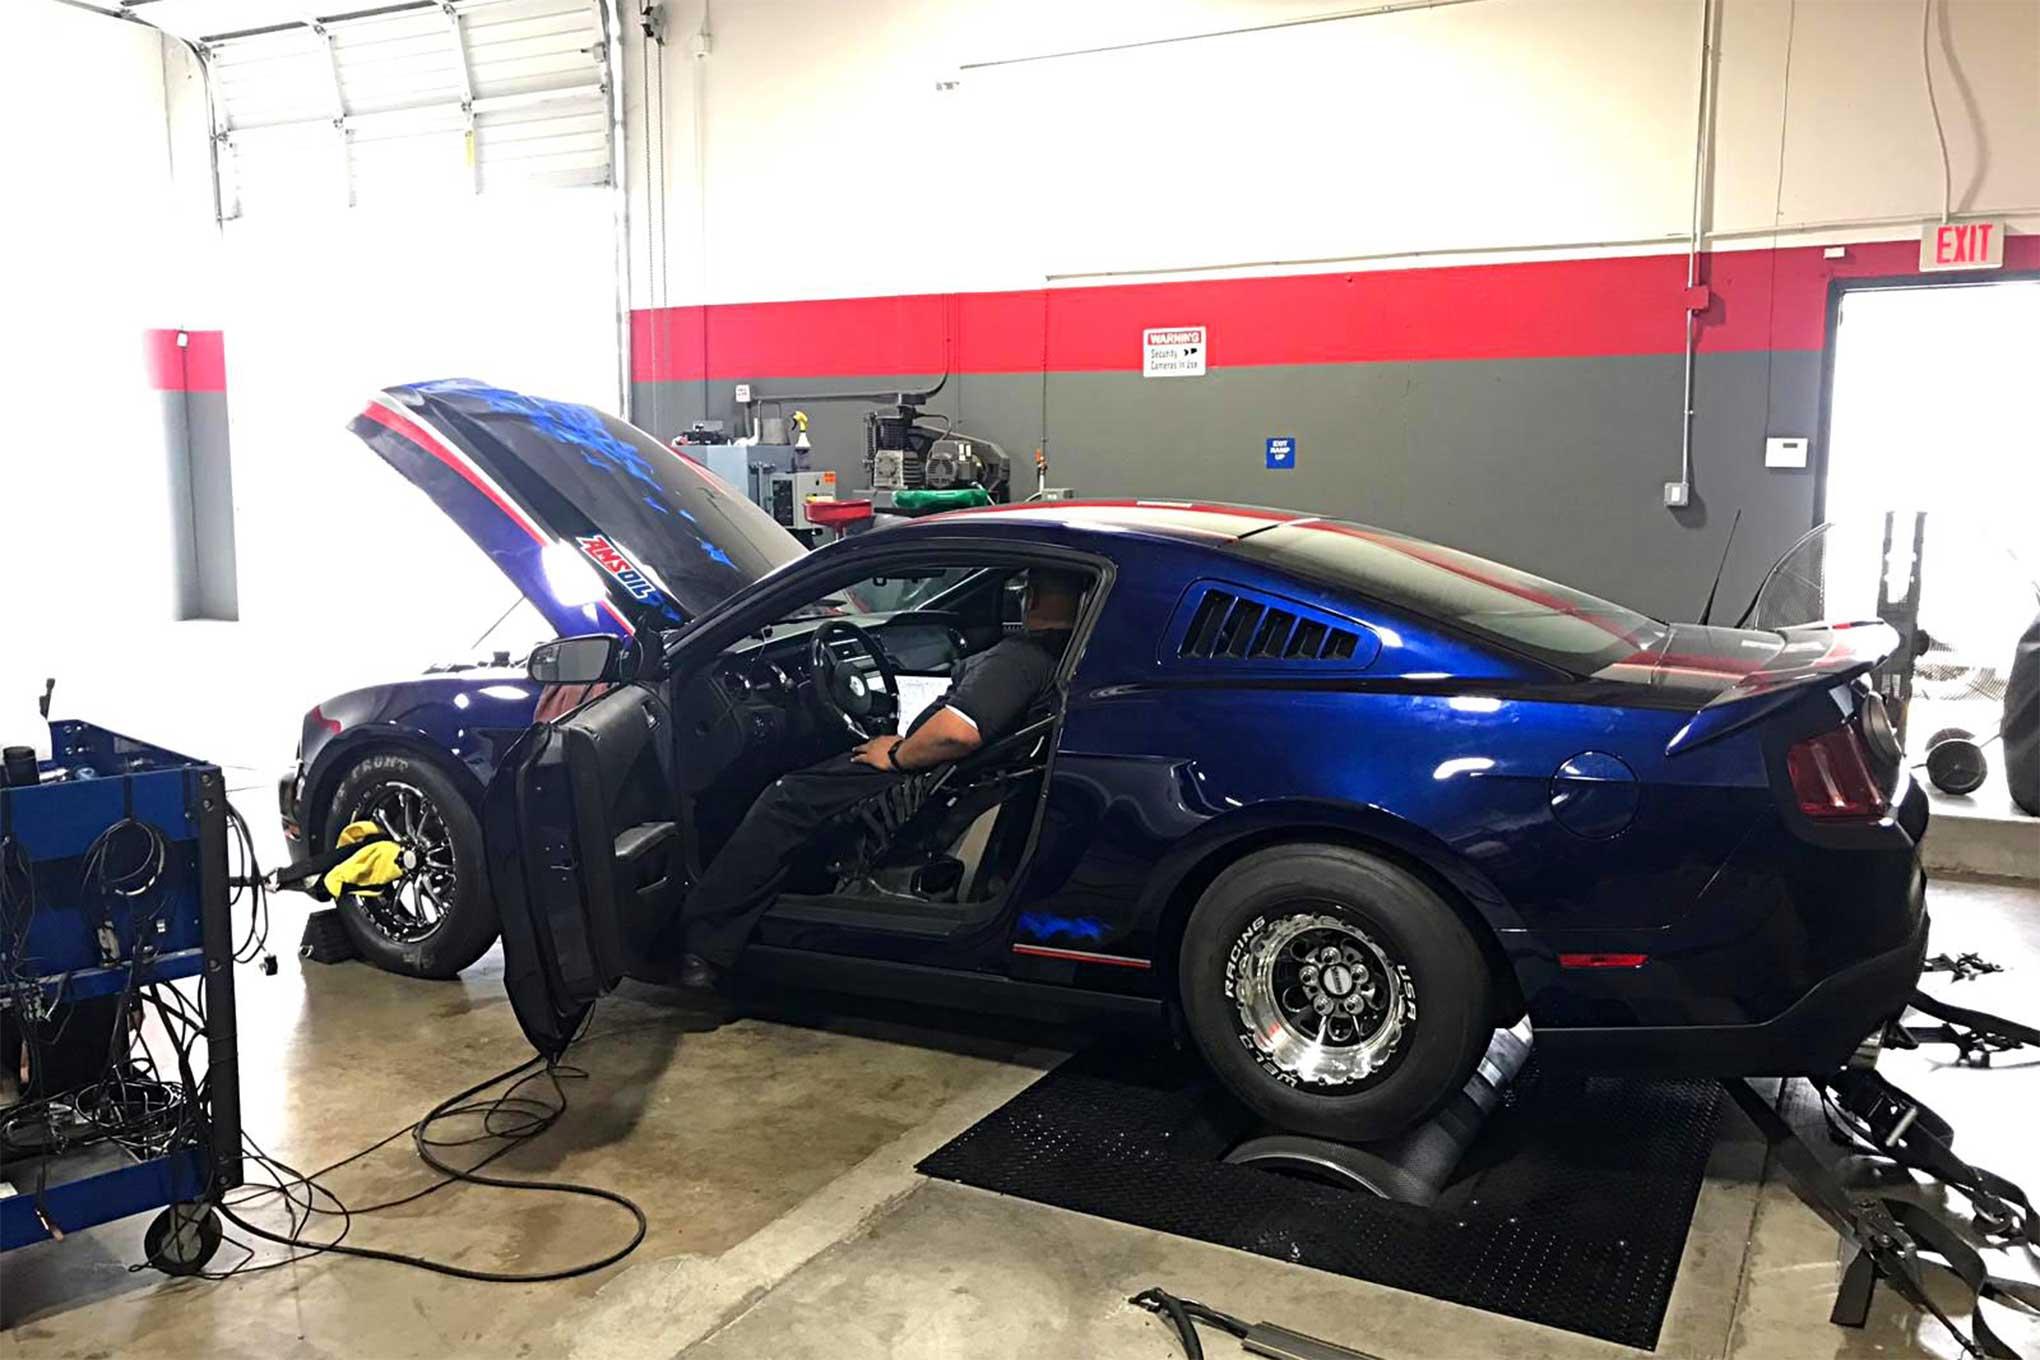 026 Mustang Procharger Dyno Addiction Motorsports